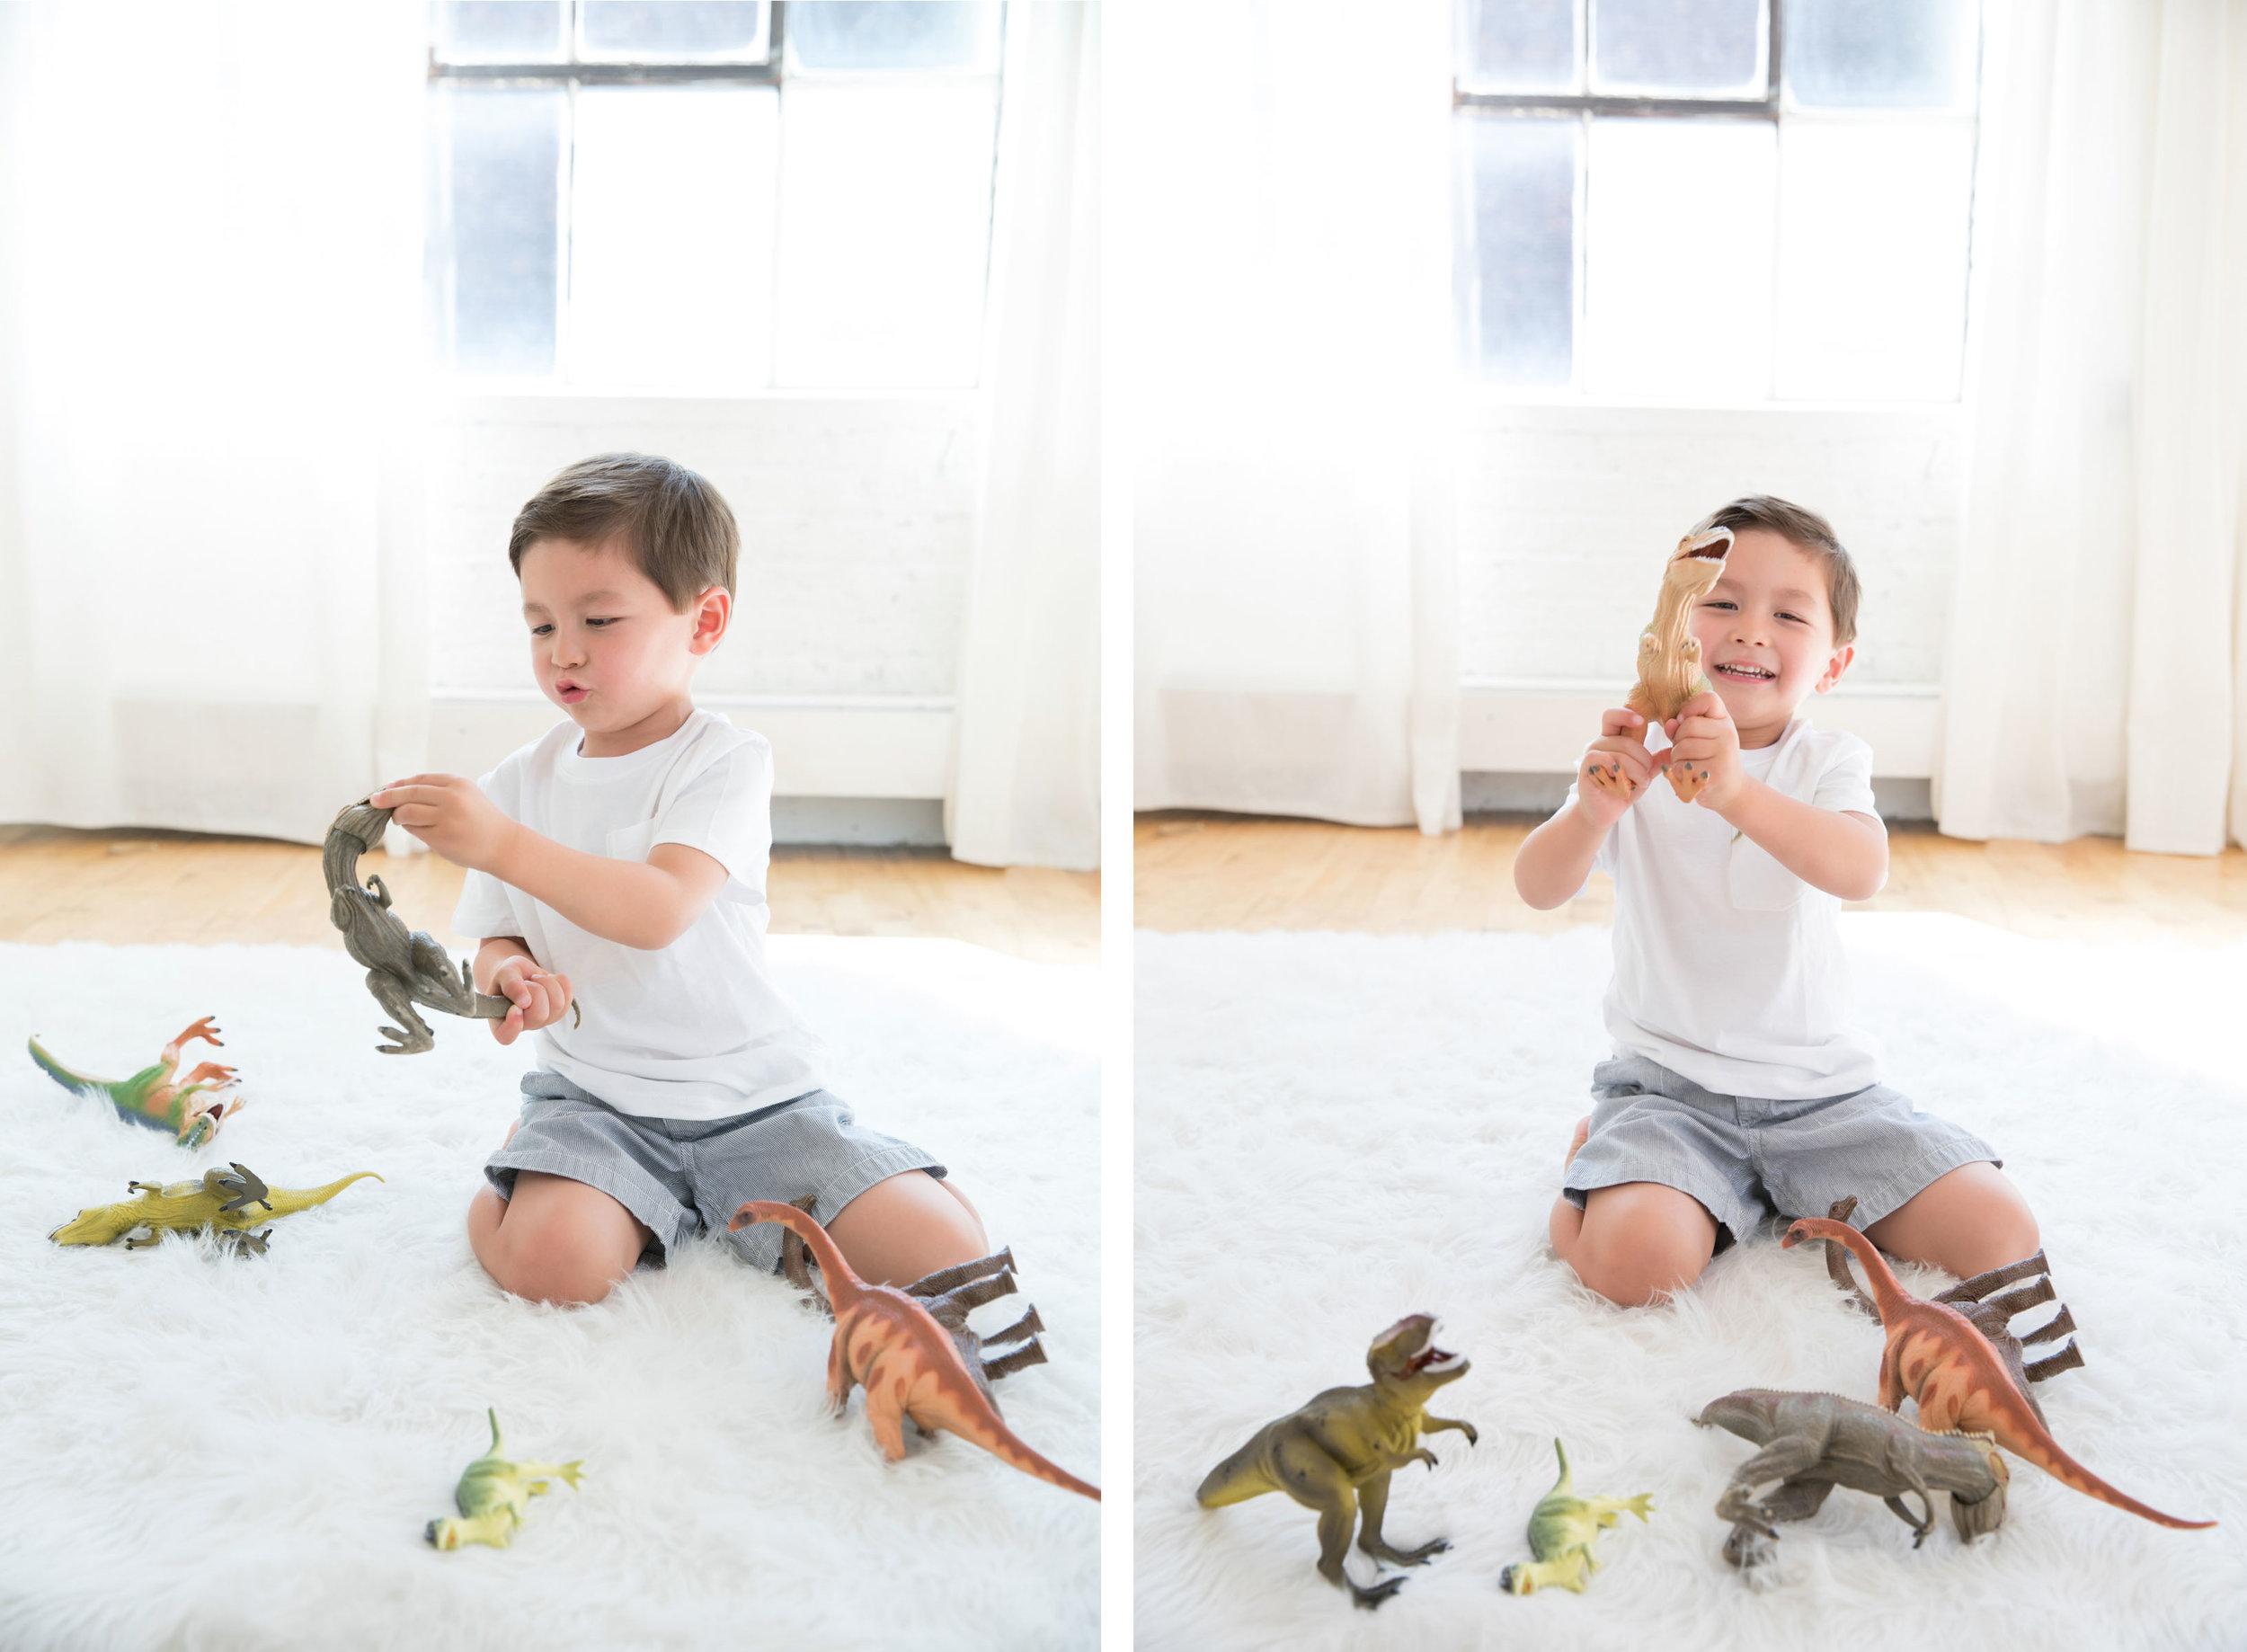 Dinosaurs_Little_Boy_Playing.jpg